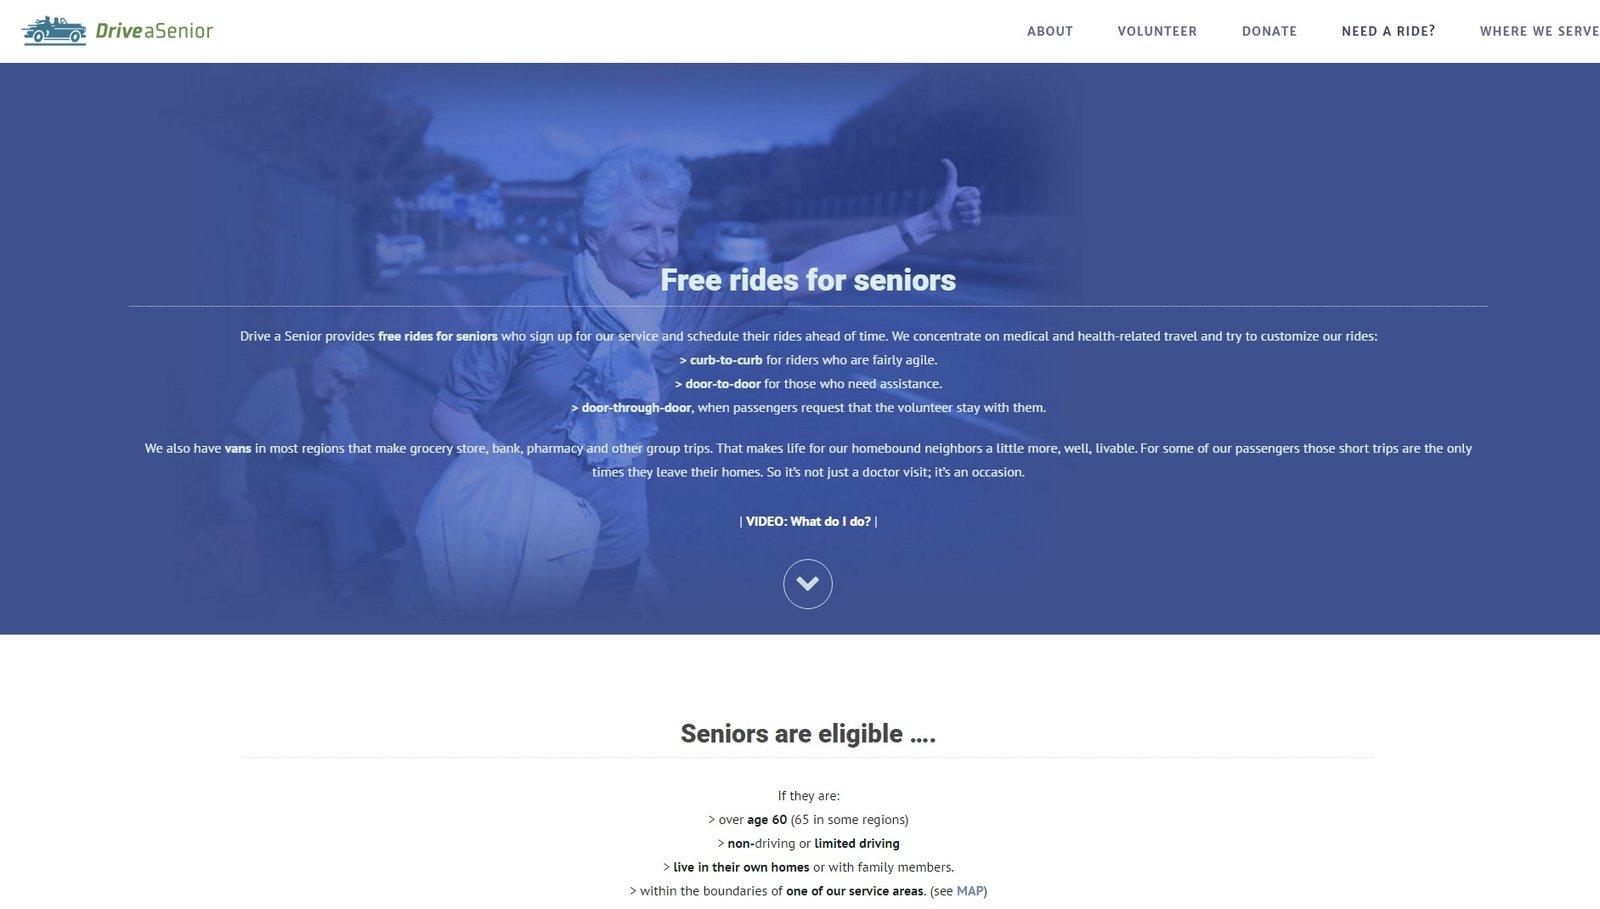 web design of Drive a Senior